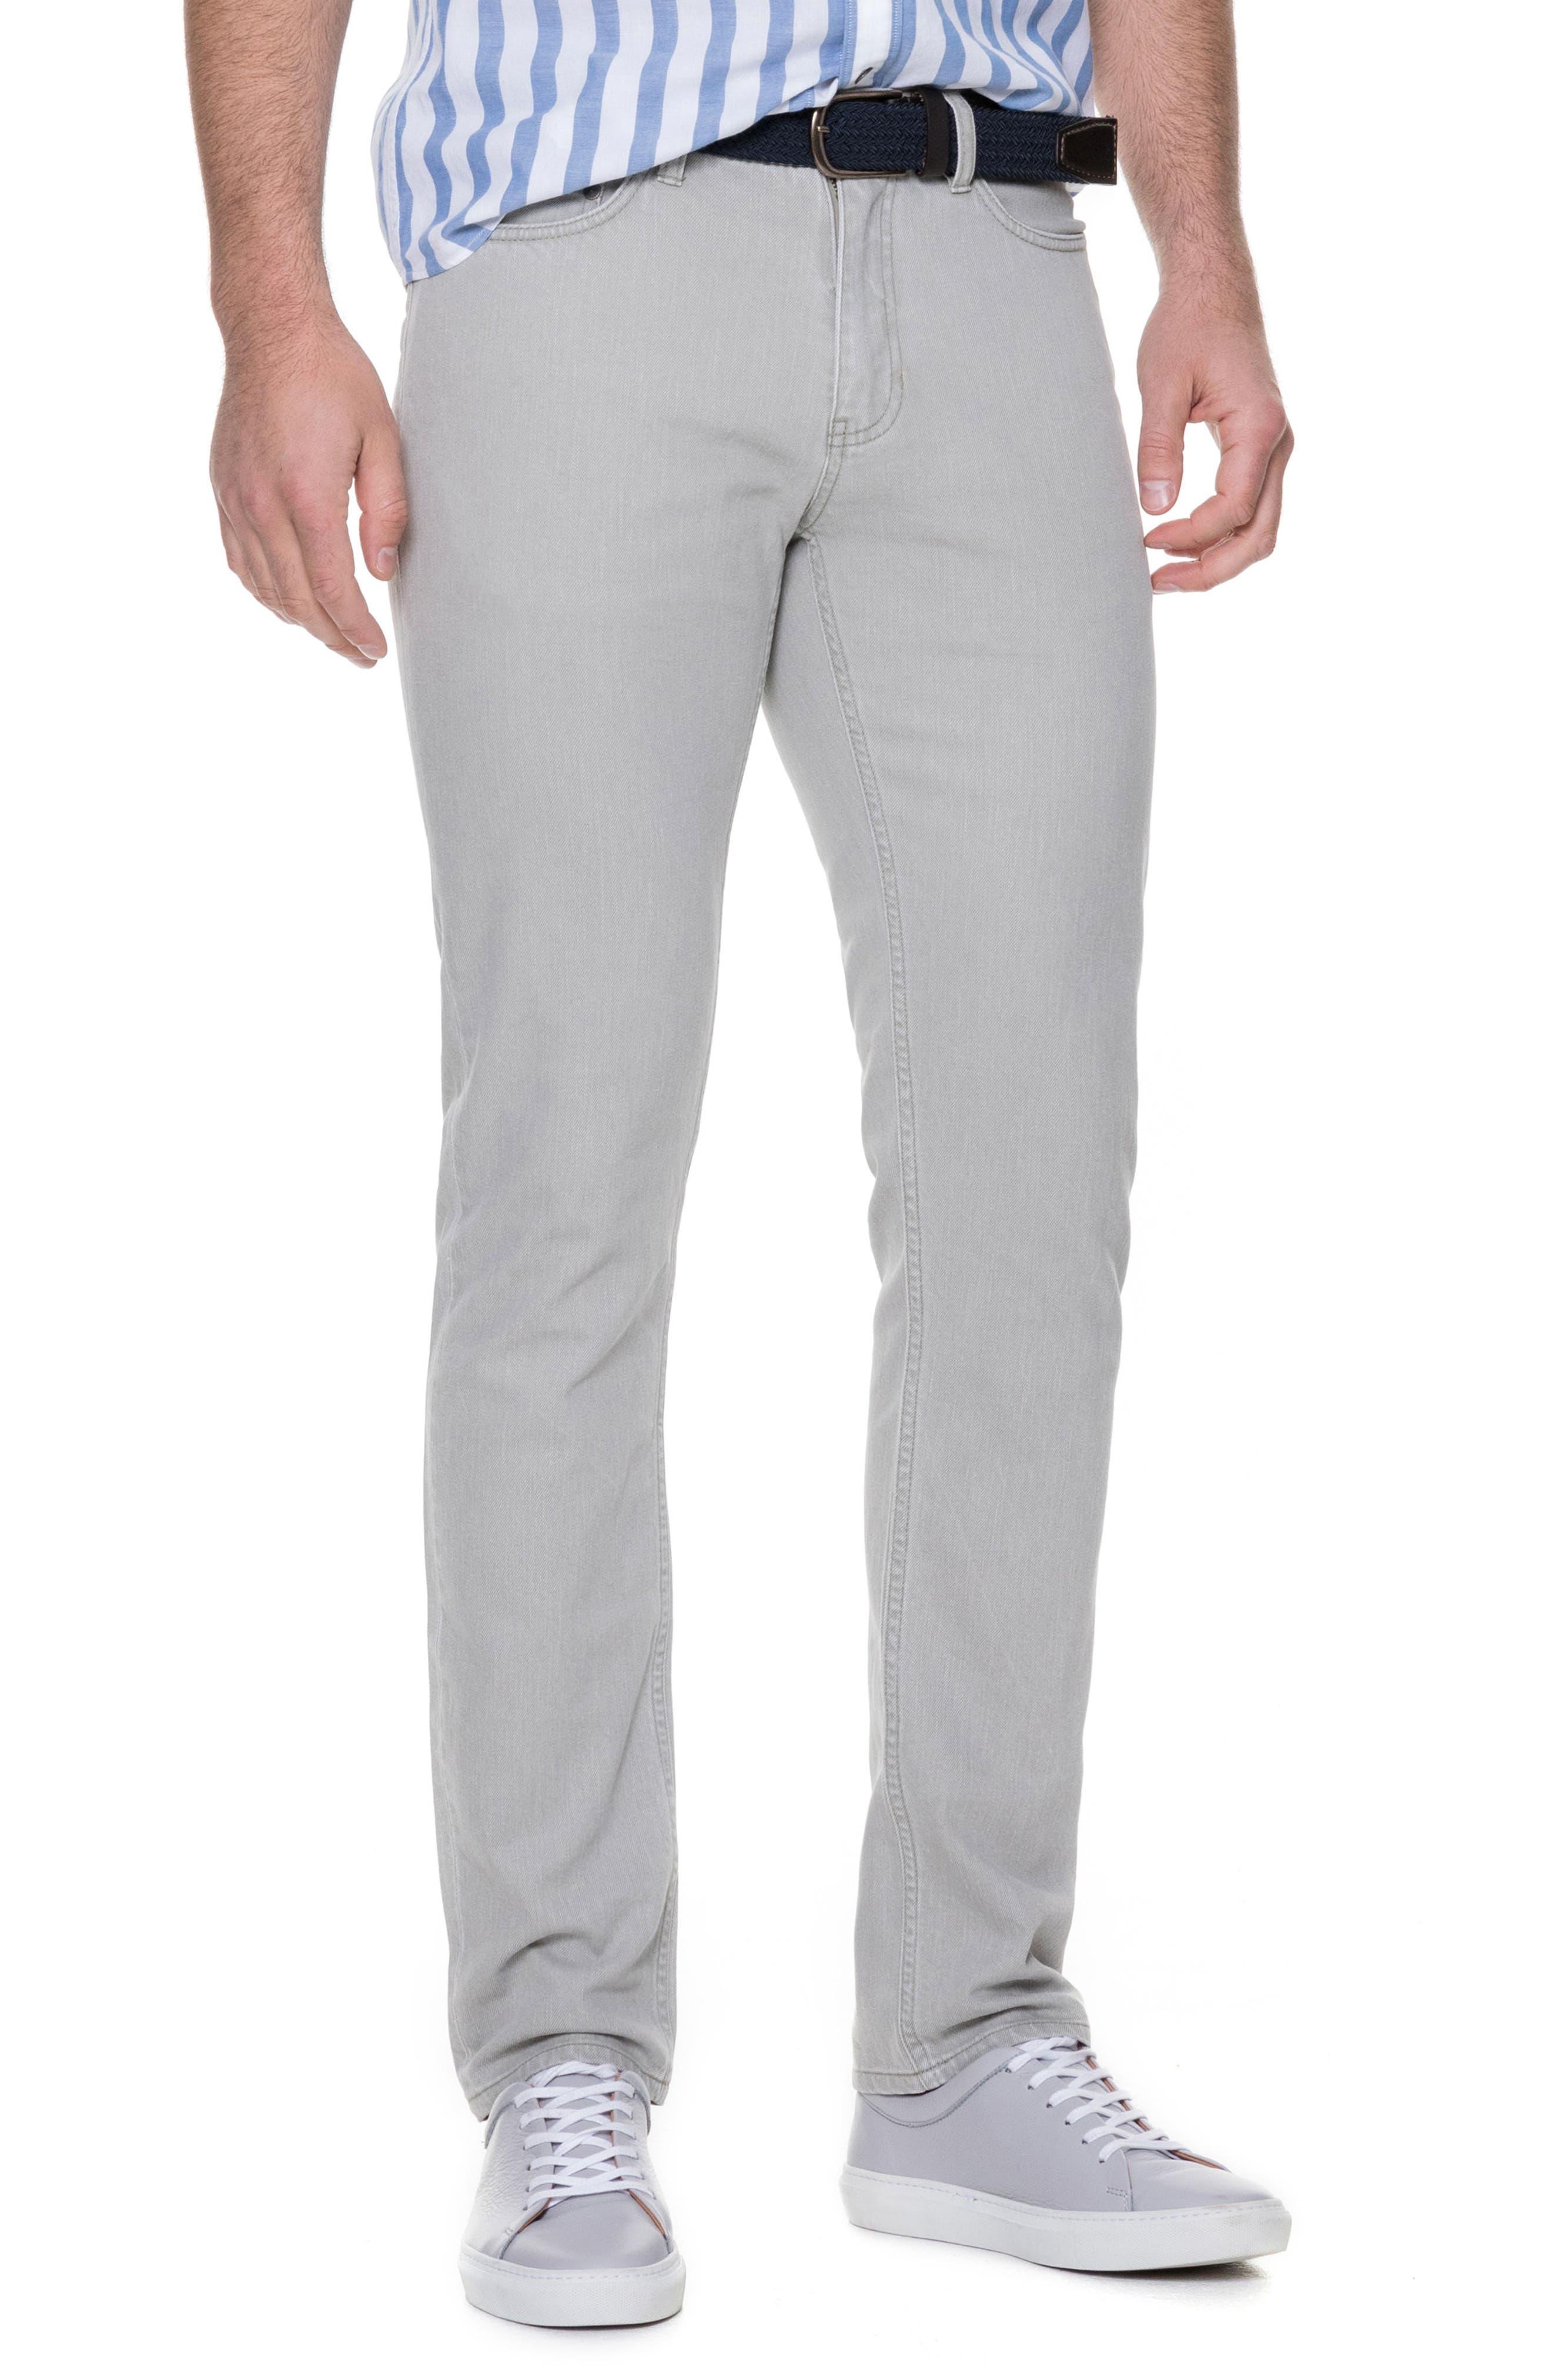 Tolson Straight Leg Jeans,                         Main,                         color, 249